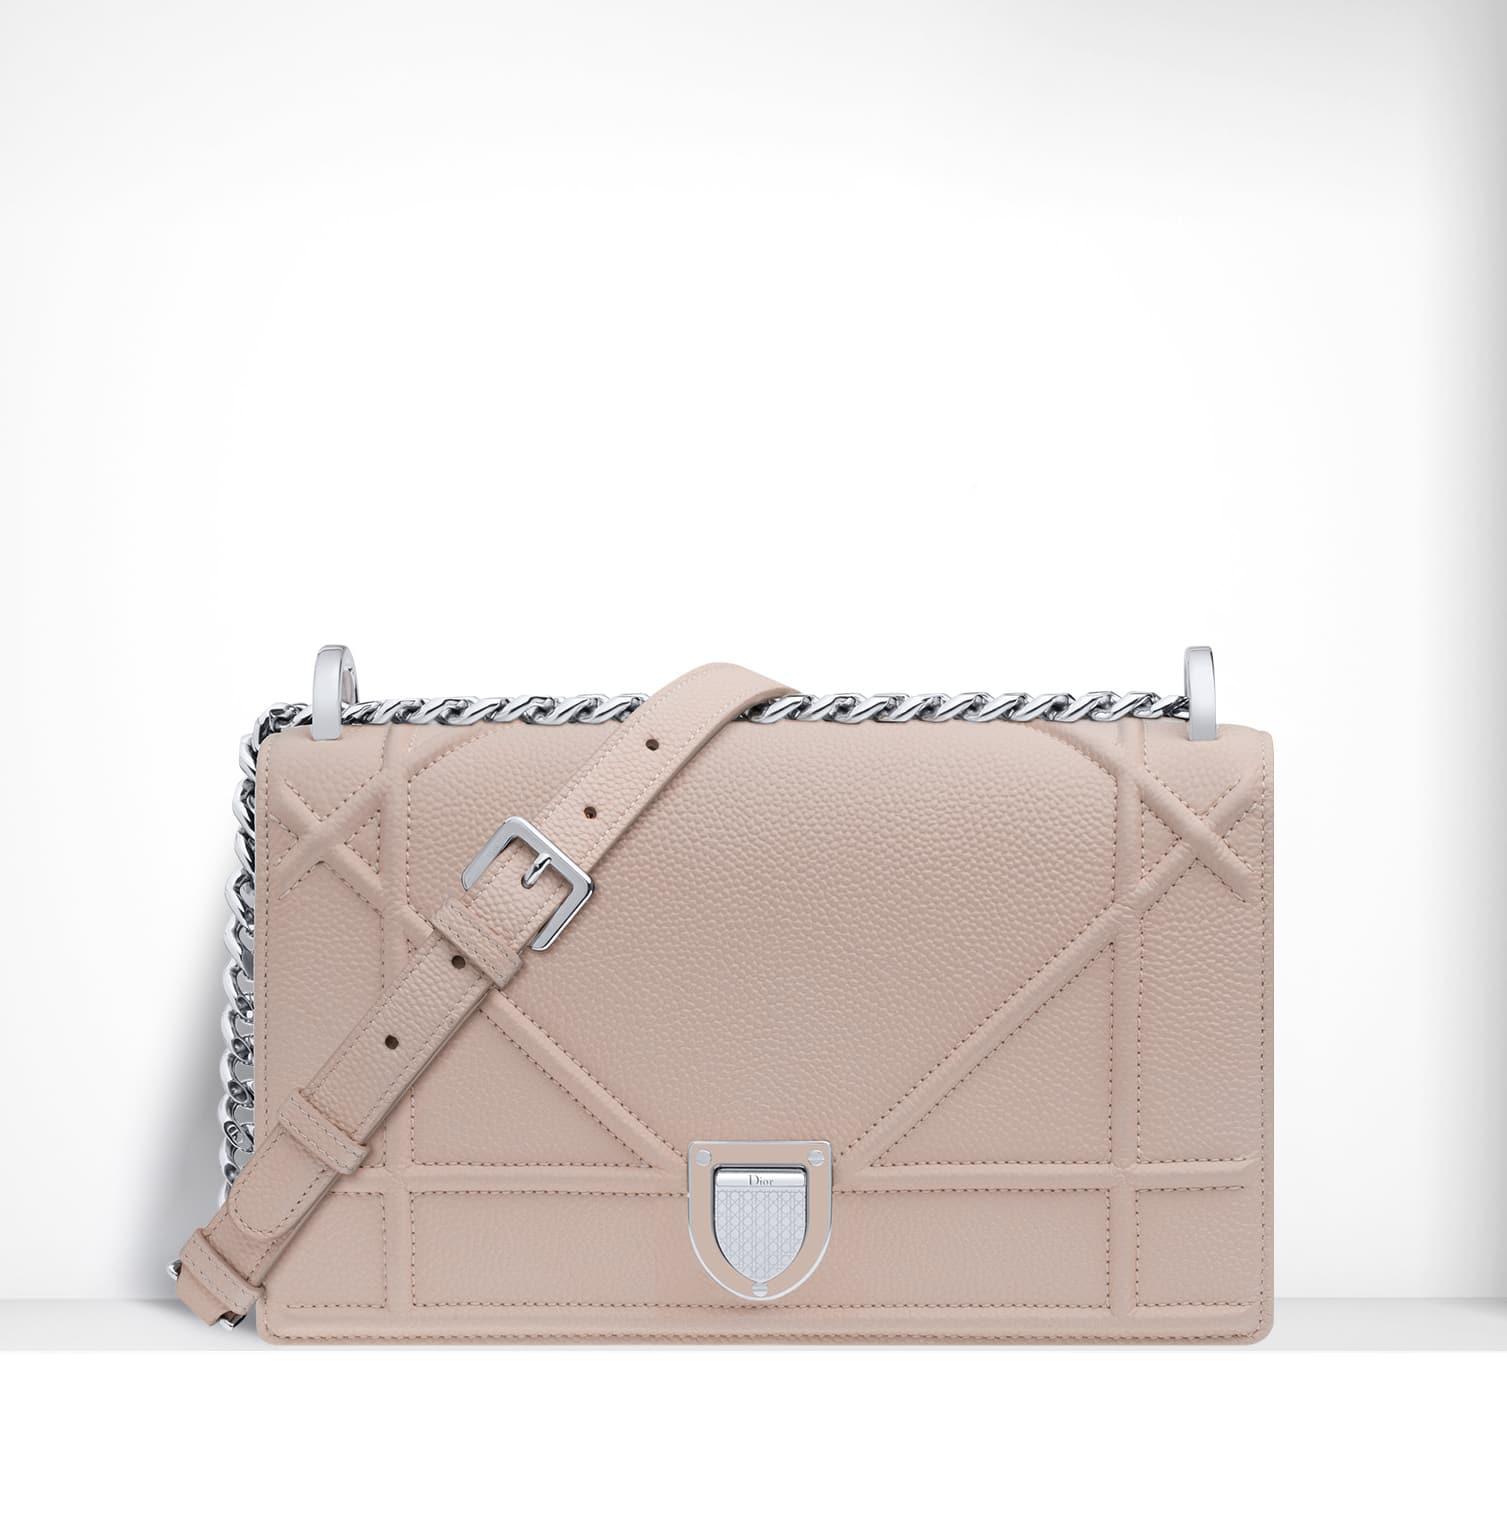 dior rose poudre diorama flap bag spring 2015 - Poudre Color Run